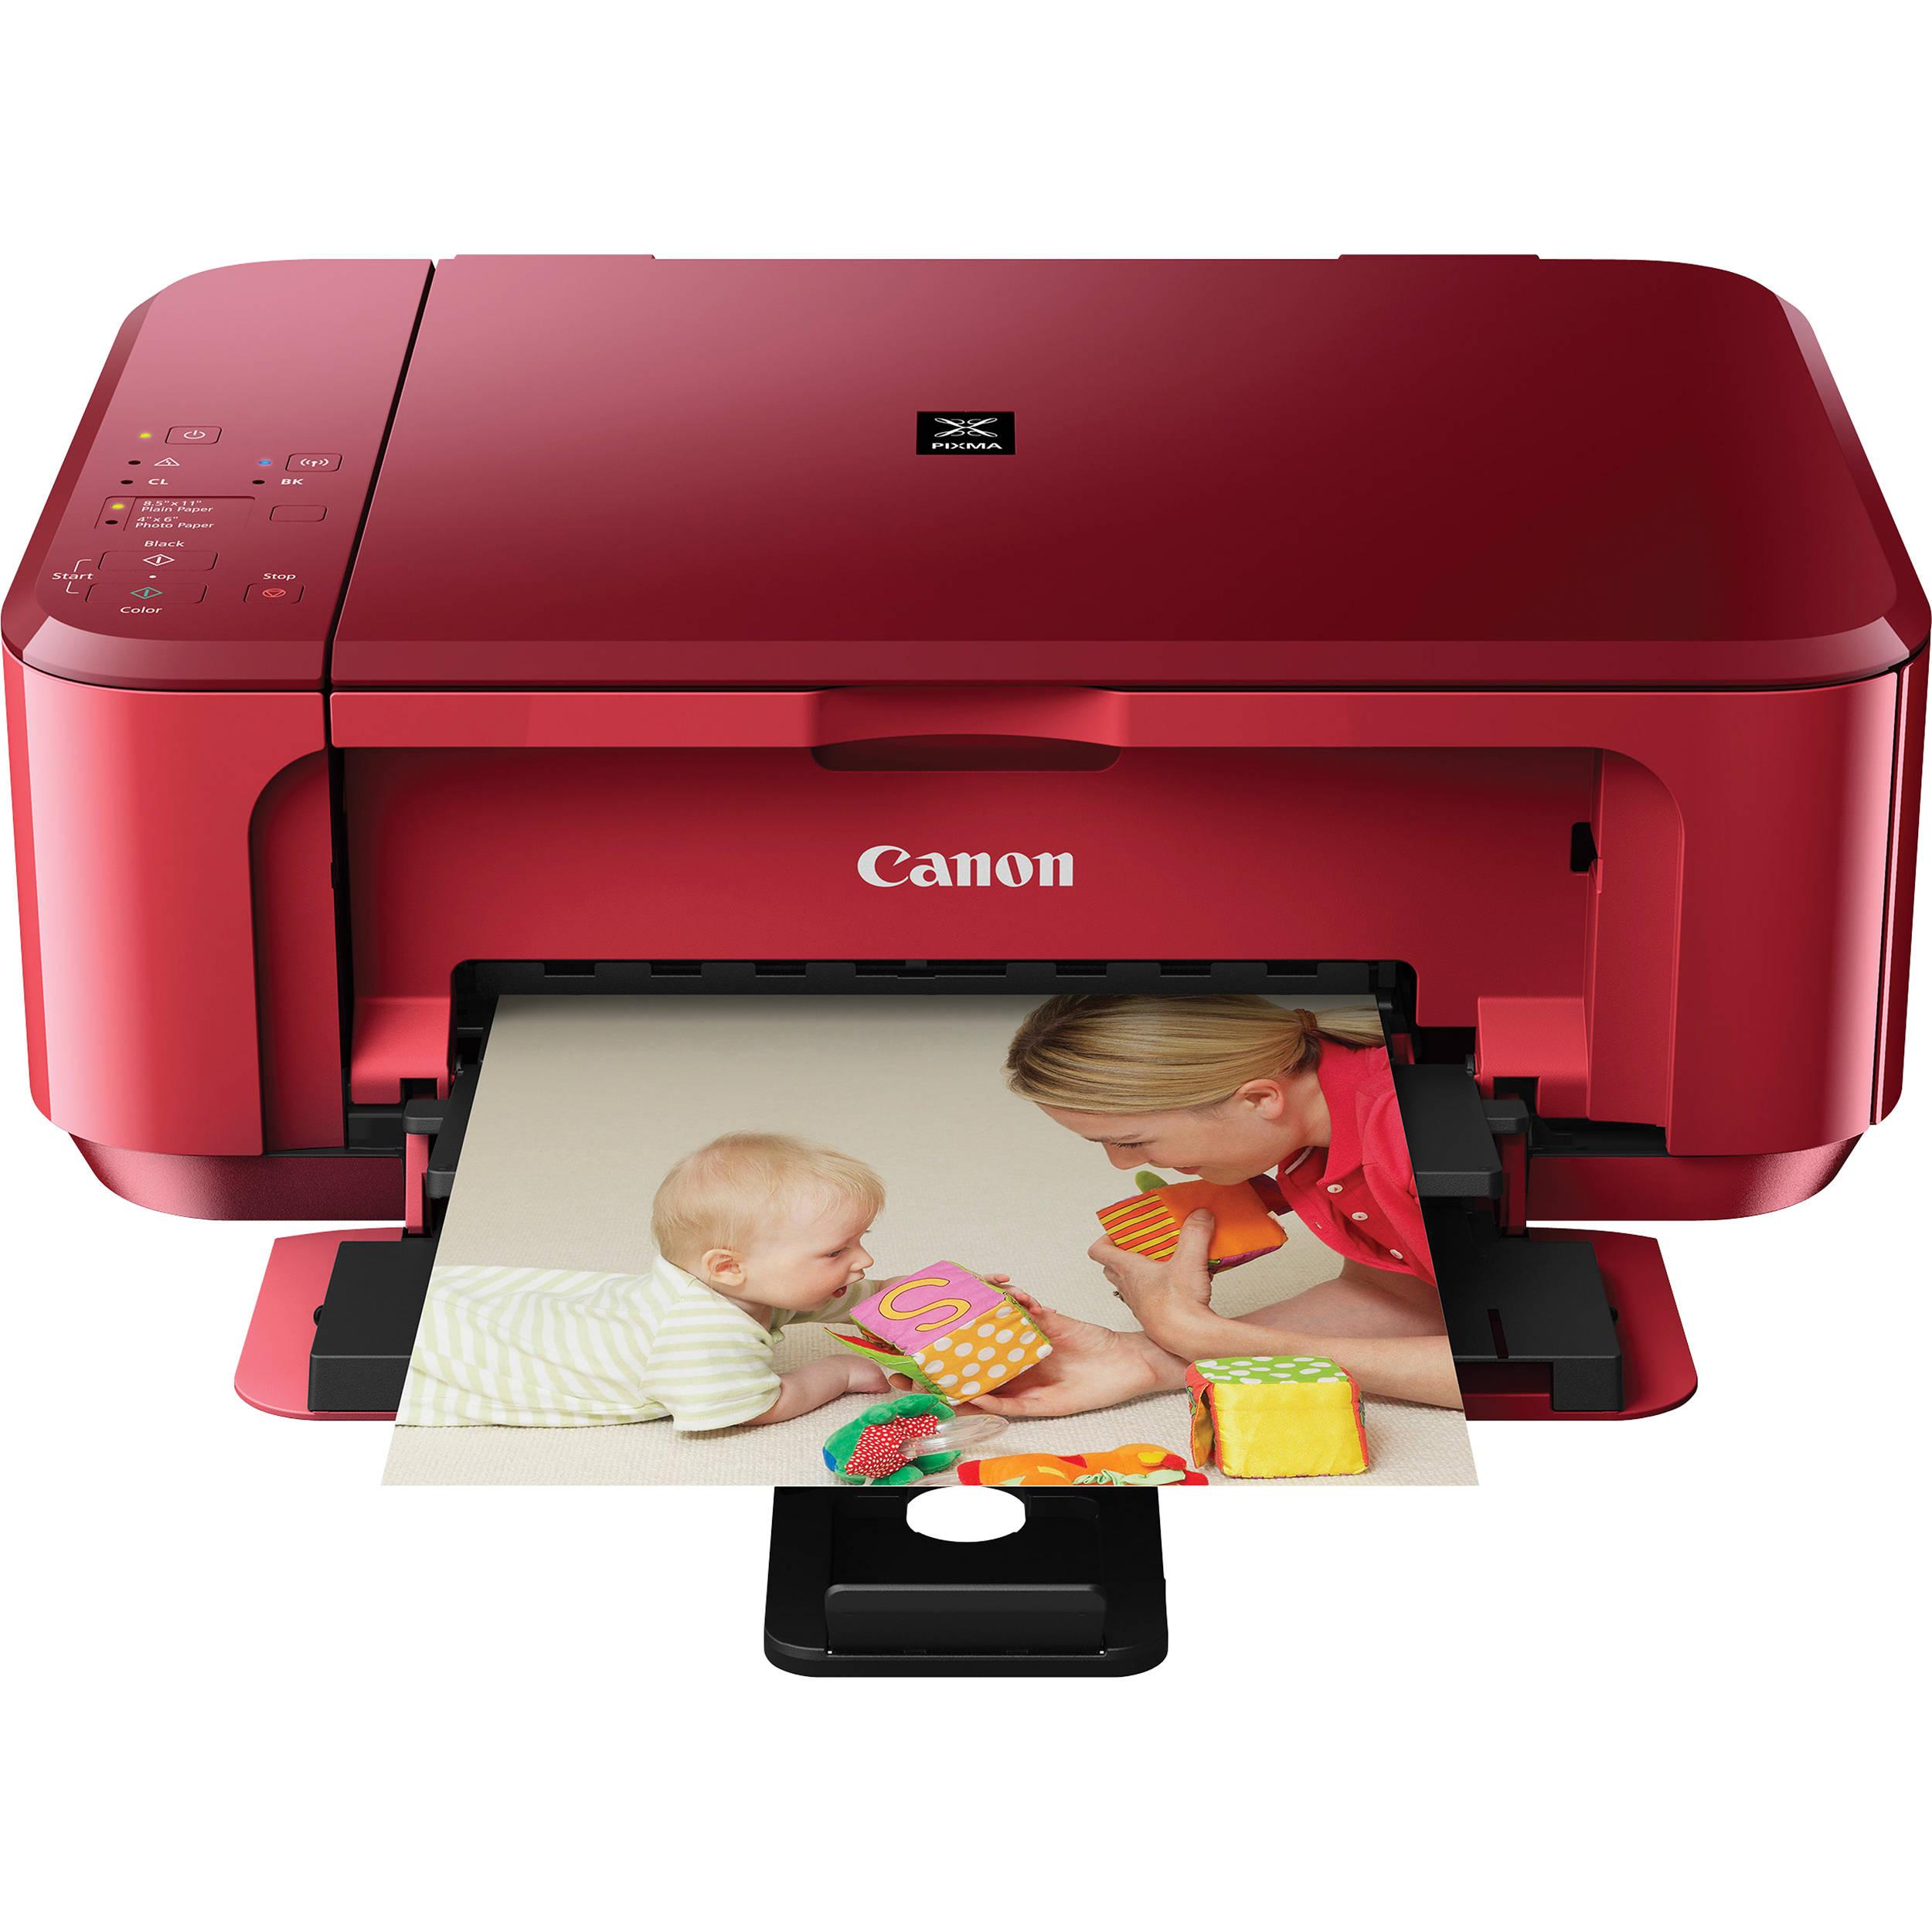 Color printer wireless - Canon Pixma Mg3520 Wireless Color All In One Inkjet Photo Printer Red